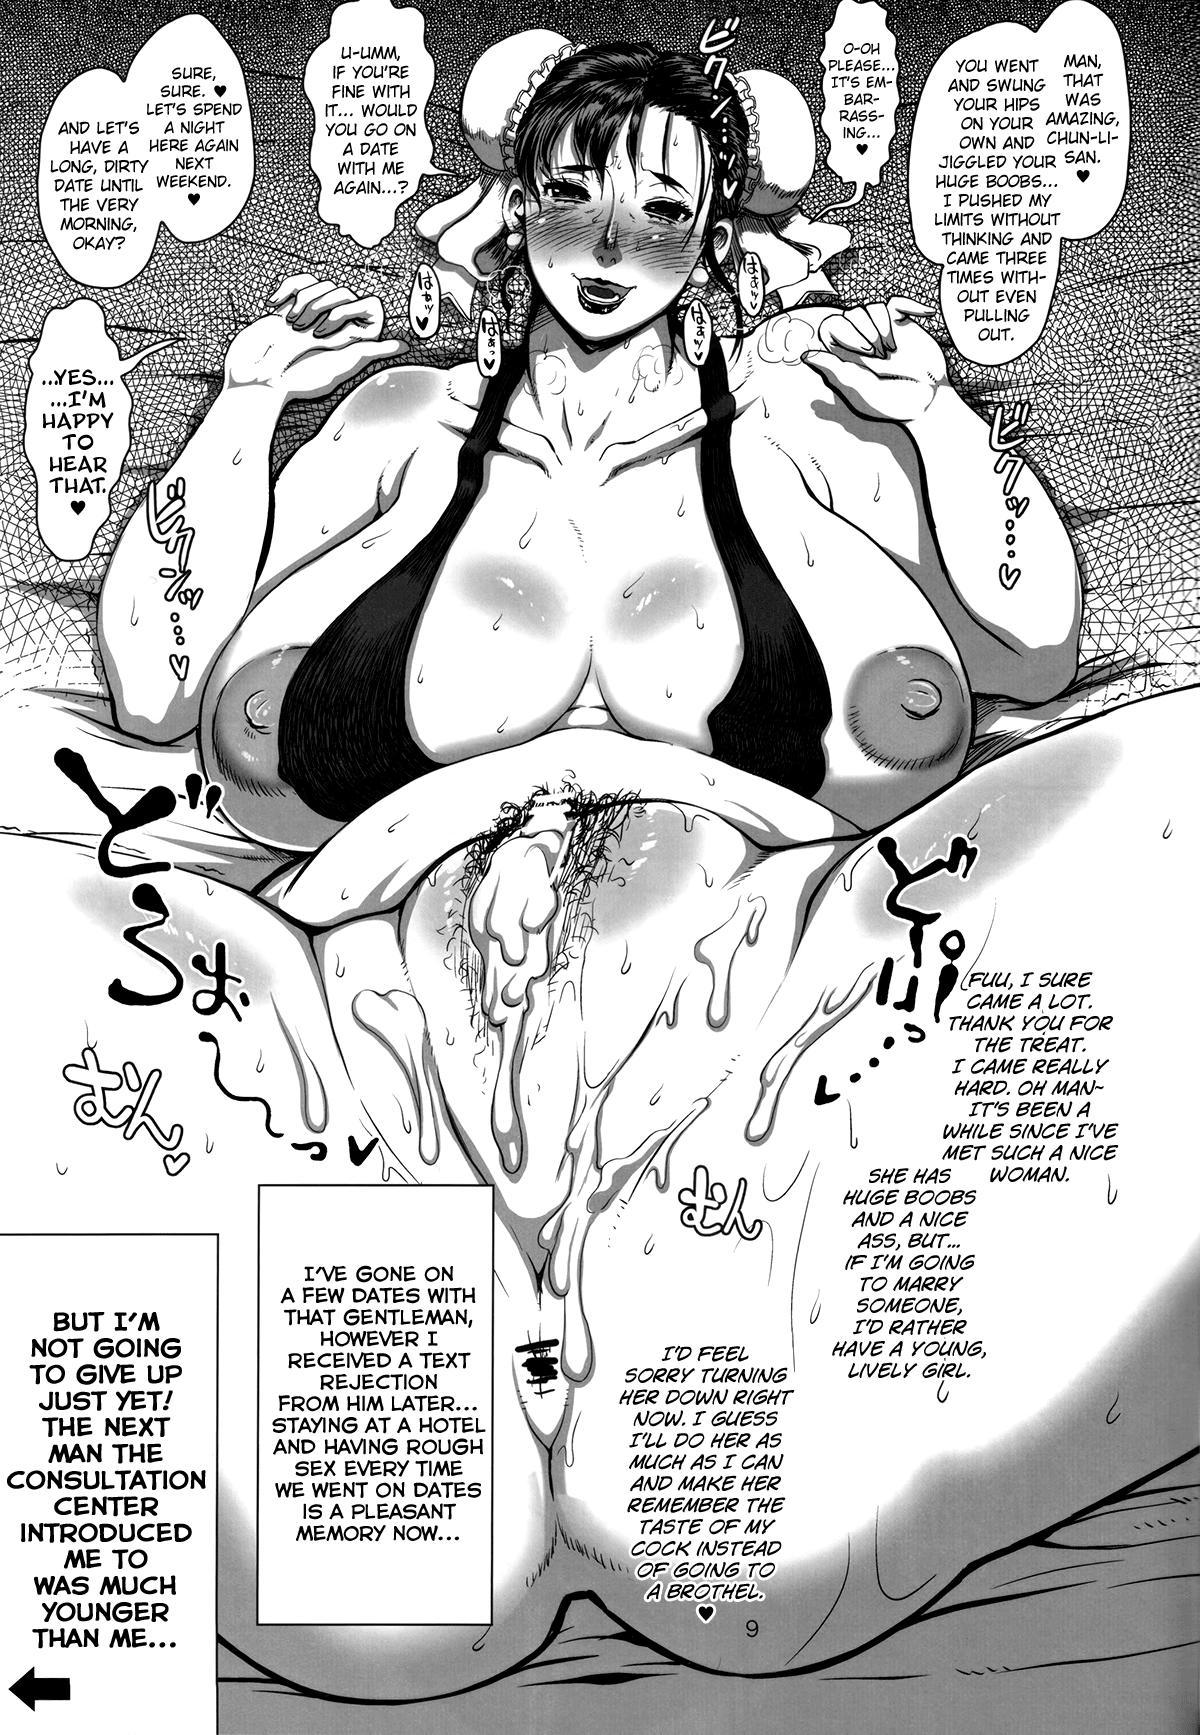 (C87) [8graphica (Yoshitama Ichirou, Nanakichi)] METABOLISM Chun-Li A Beautiful and Mature Chun-Li-san has Serious Sex with the Candidates while Looking For a Marriage Partner. (Street Fighter) [English] [biribiri] 7